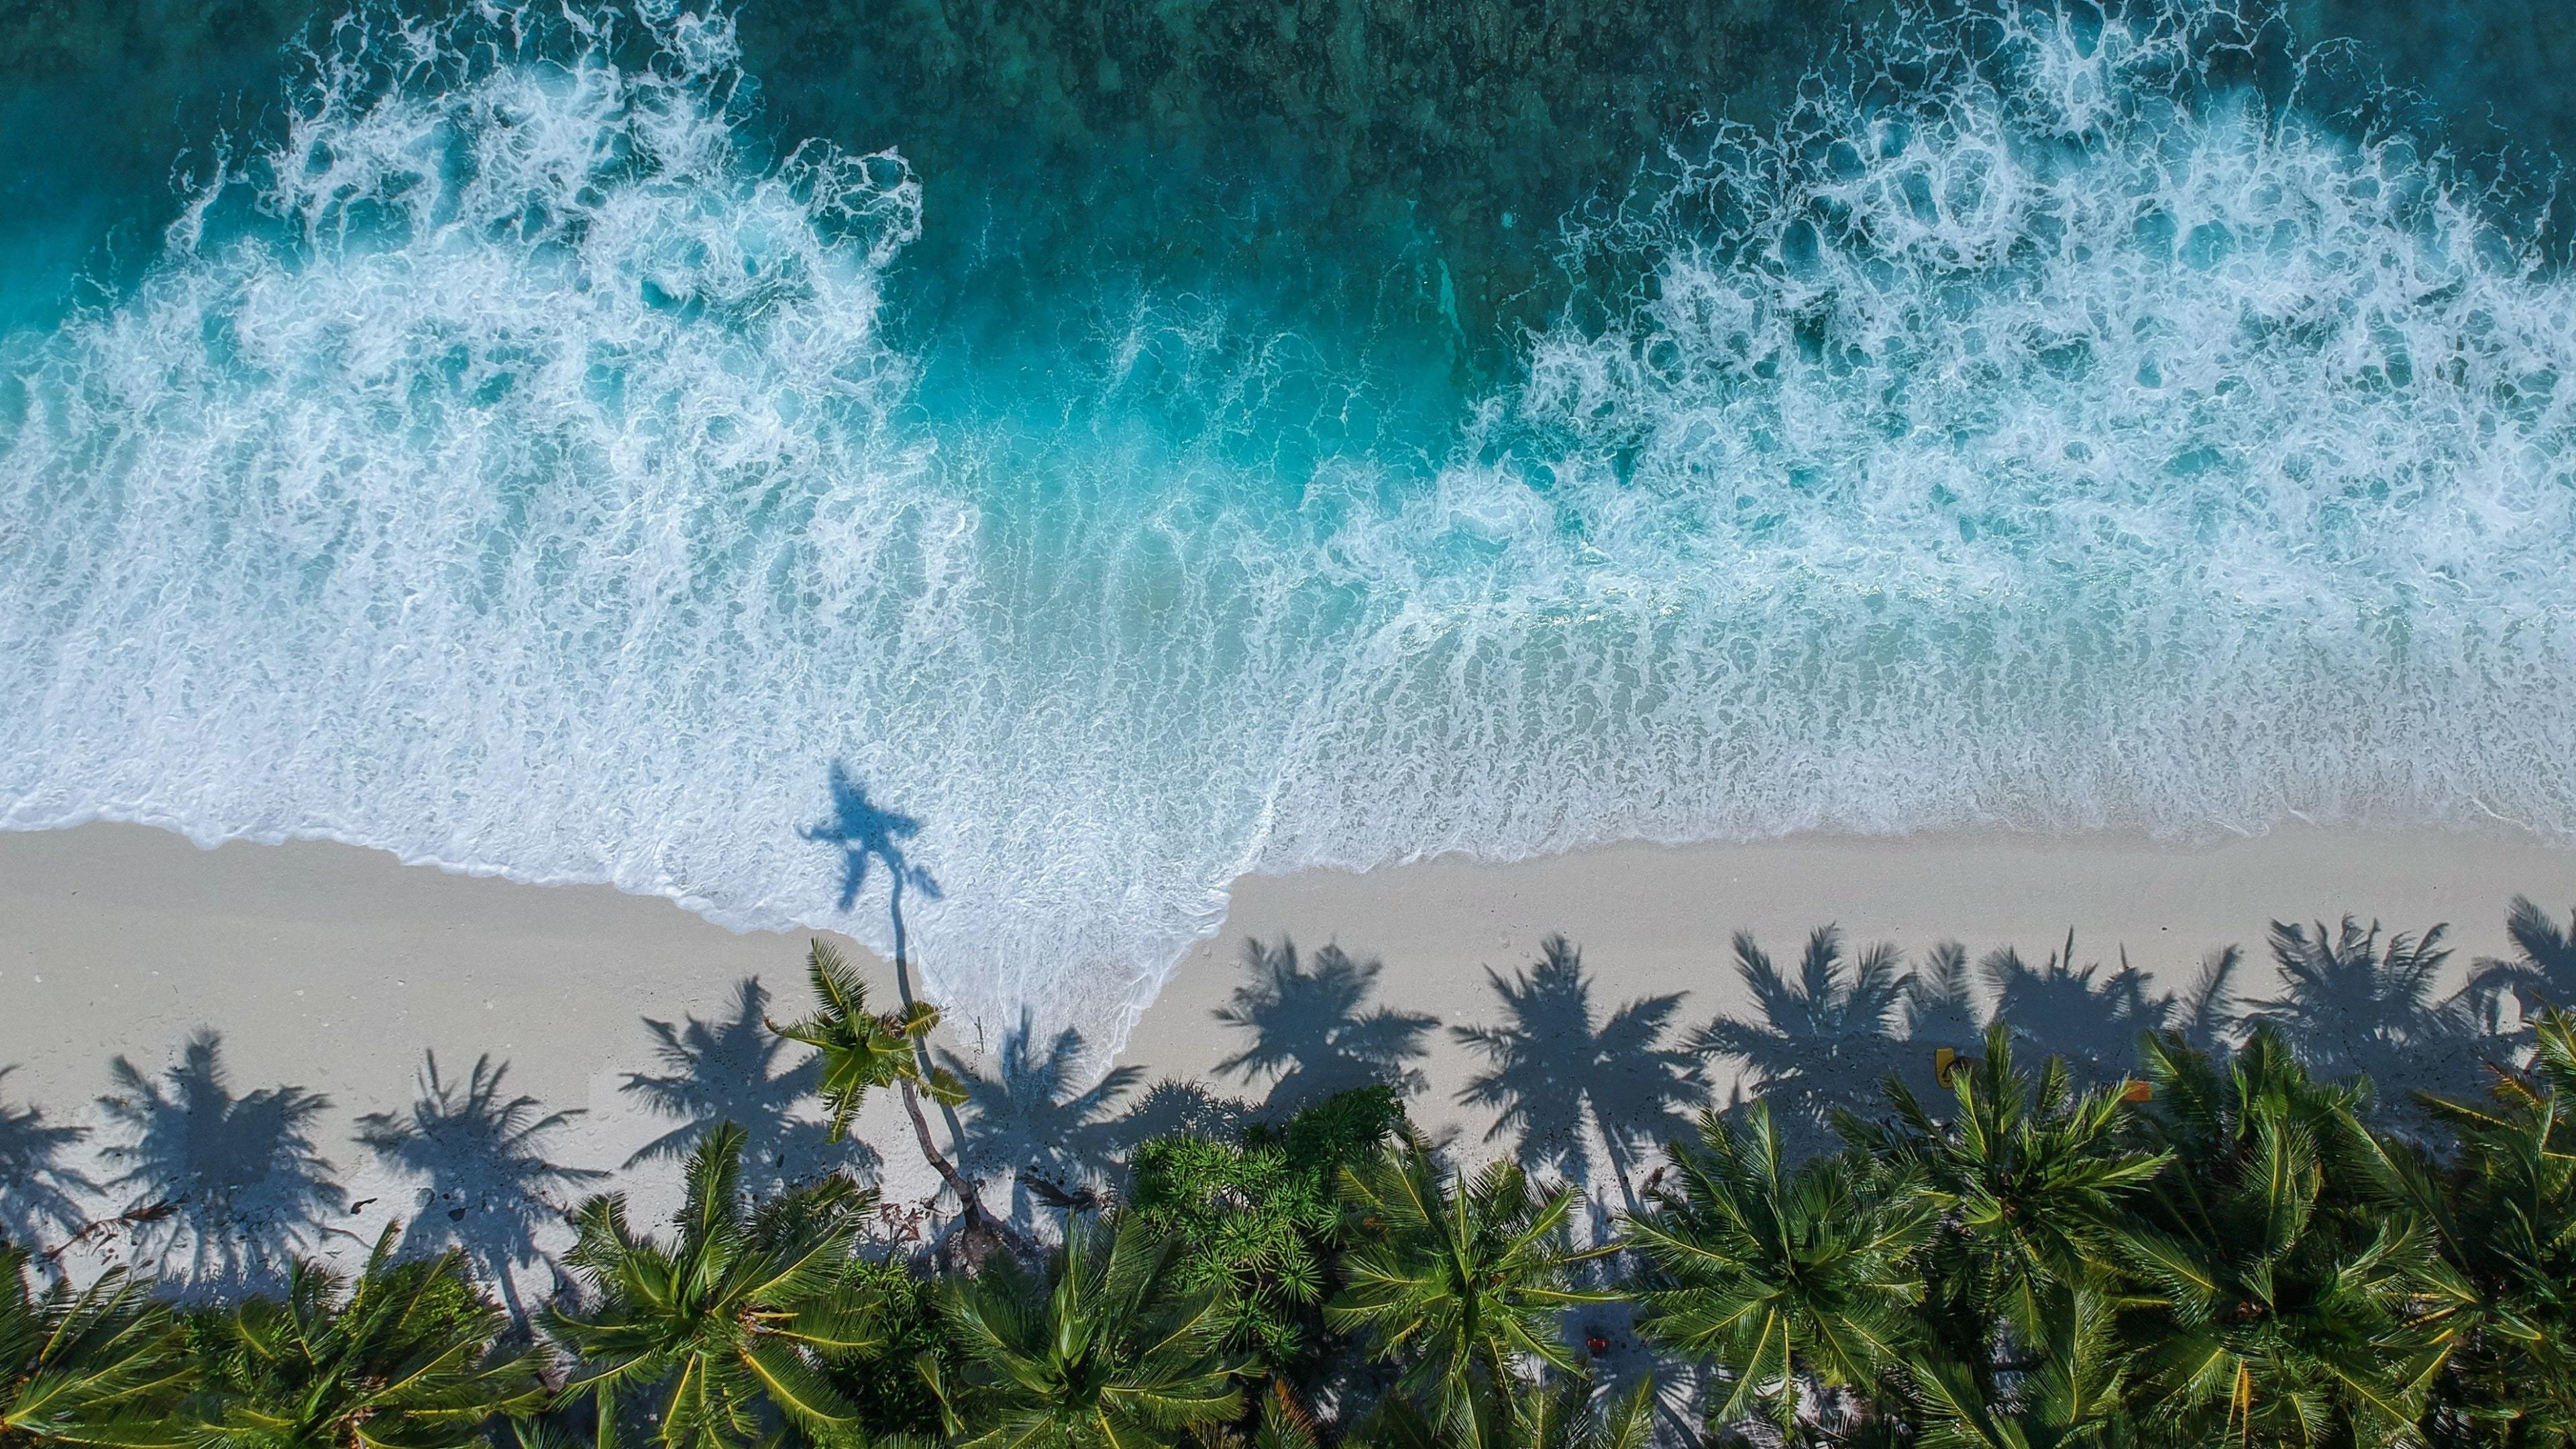 Download 3840x2160 Wallpaper Beautiful Beach Aerial View